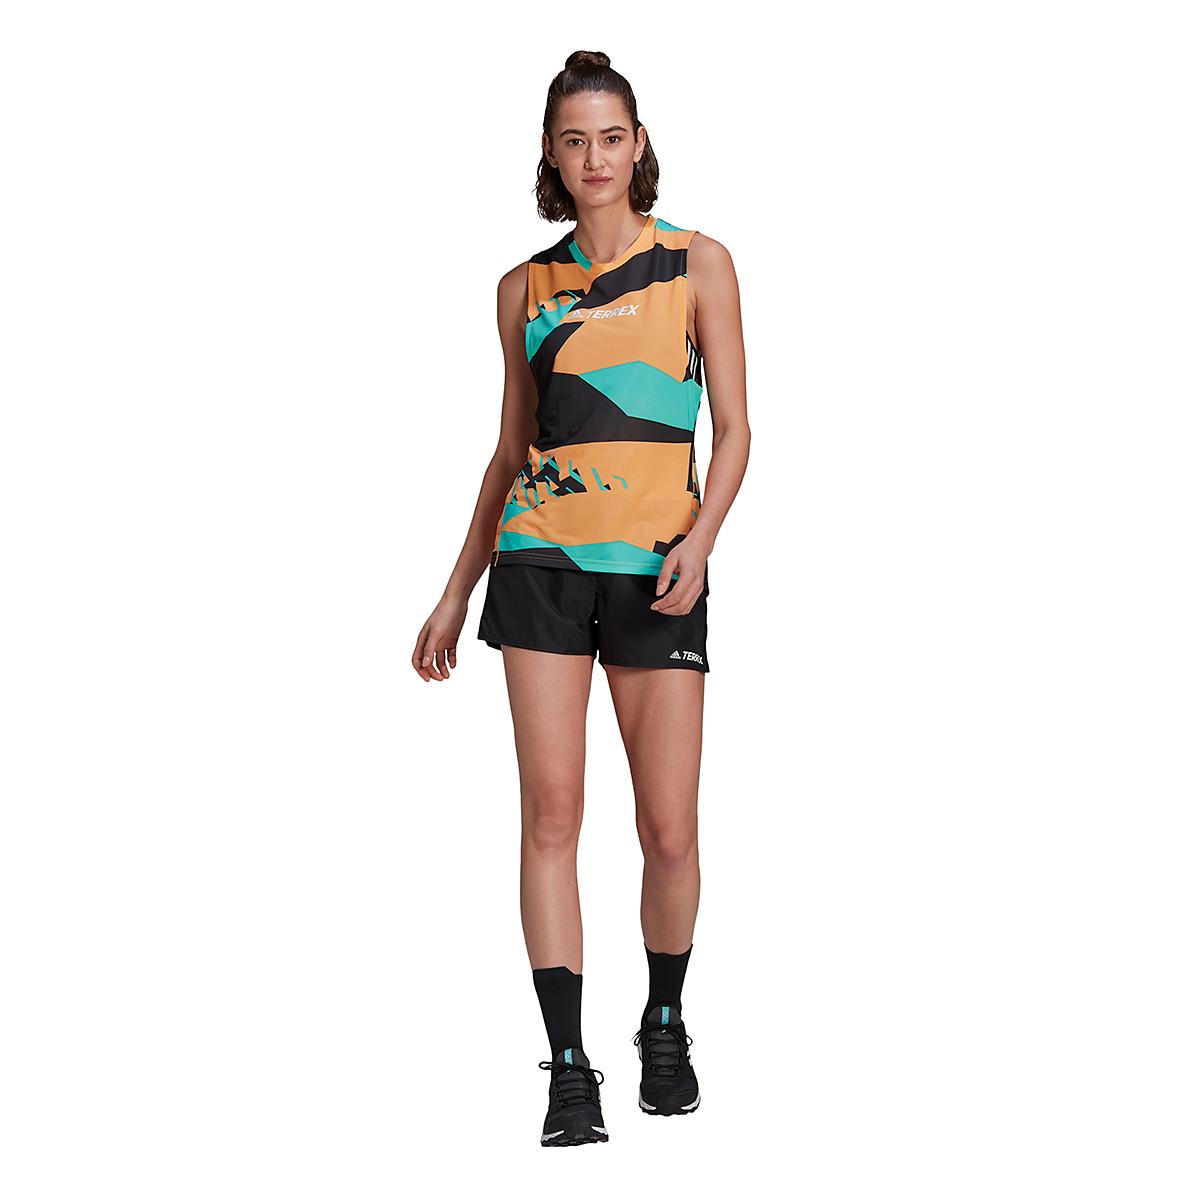 Women's Adidas Terrex Parley Agravic TR Tank Top - Color: Hazy Orange - Size: XS, Hazy Orange, large, image 1